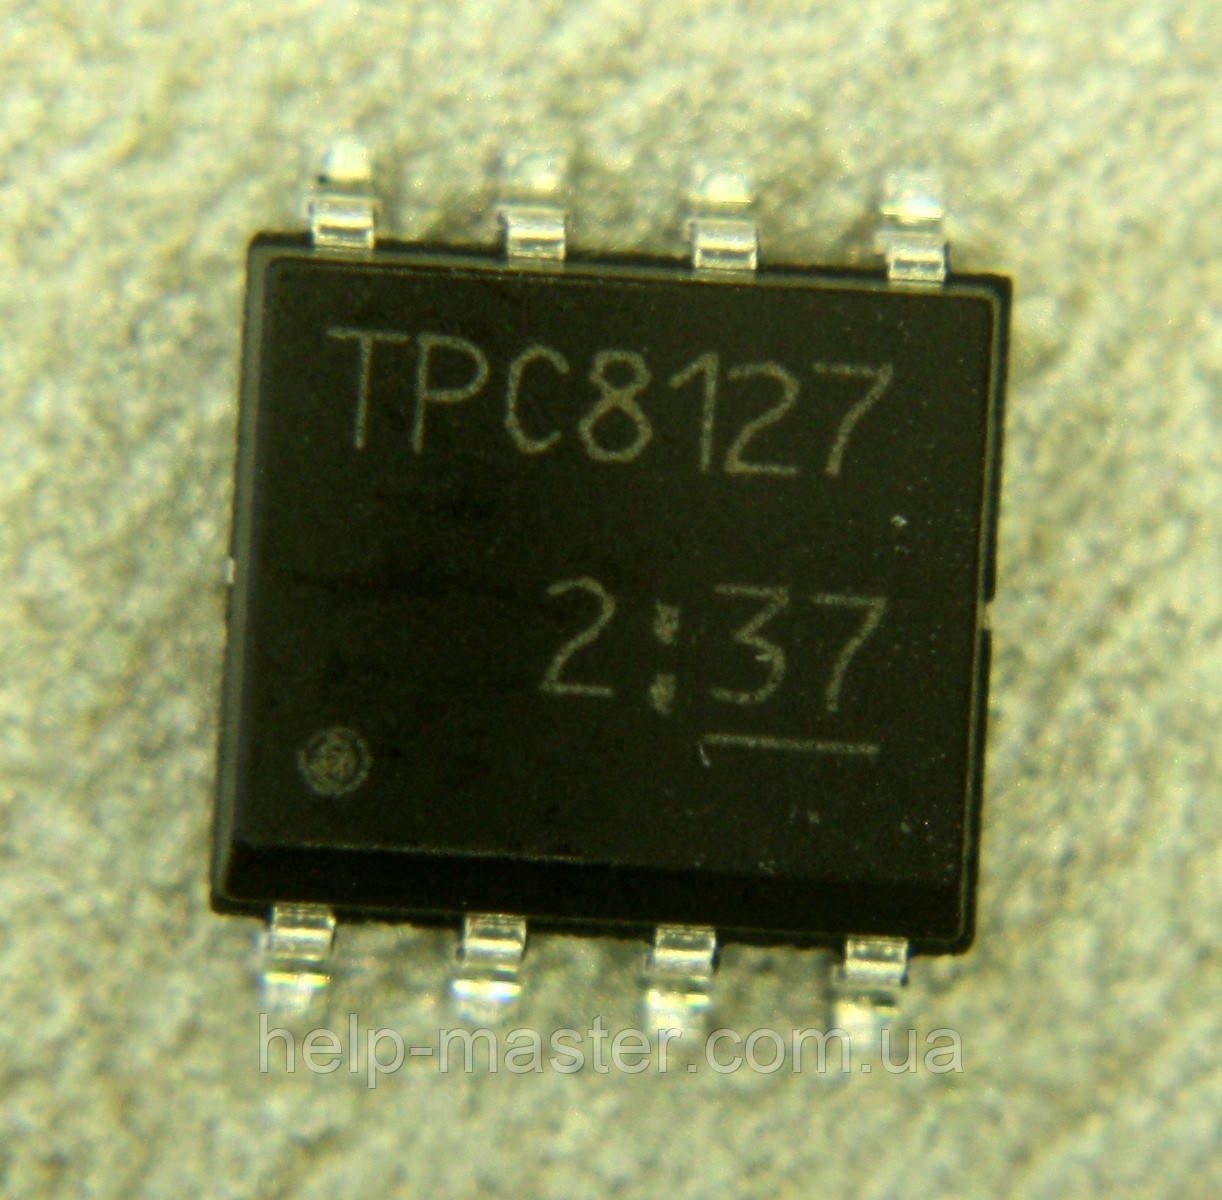 TPC8127